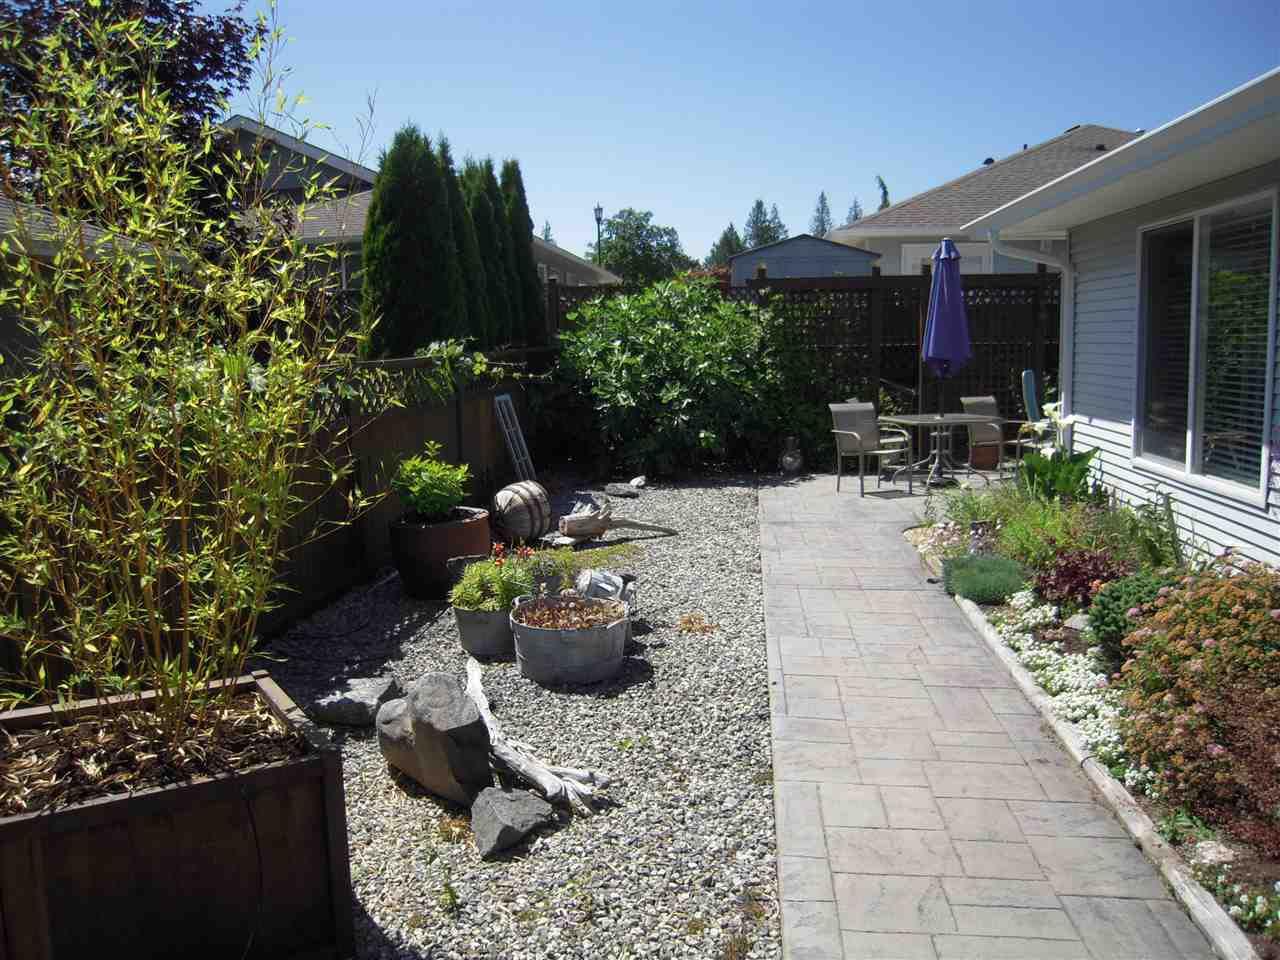 Photo 4: Photos: 5735 EMILY Way in Sechelt: Sechelt District House for sale (Sunshine Coast)  : MLS®# R2179124